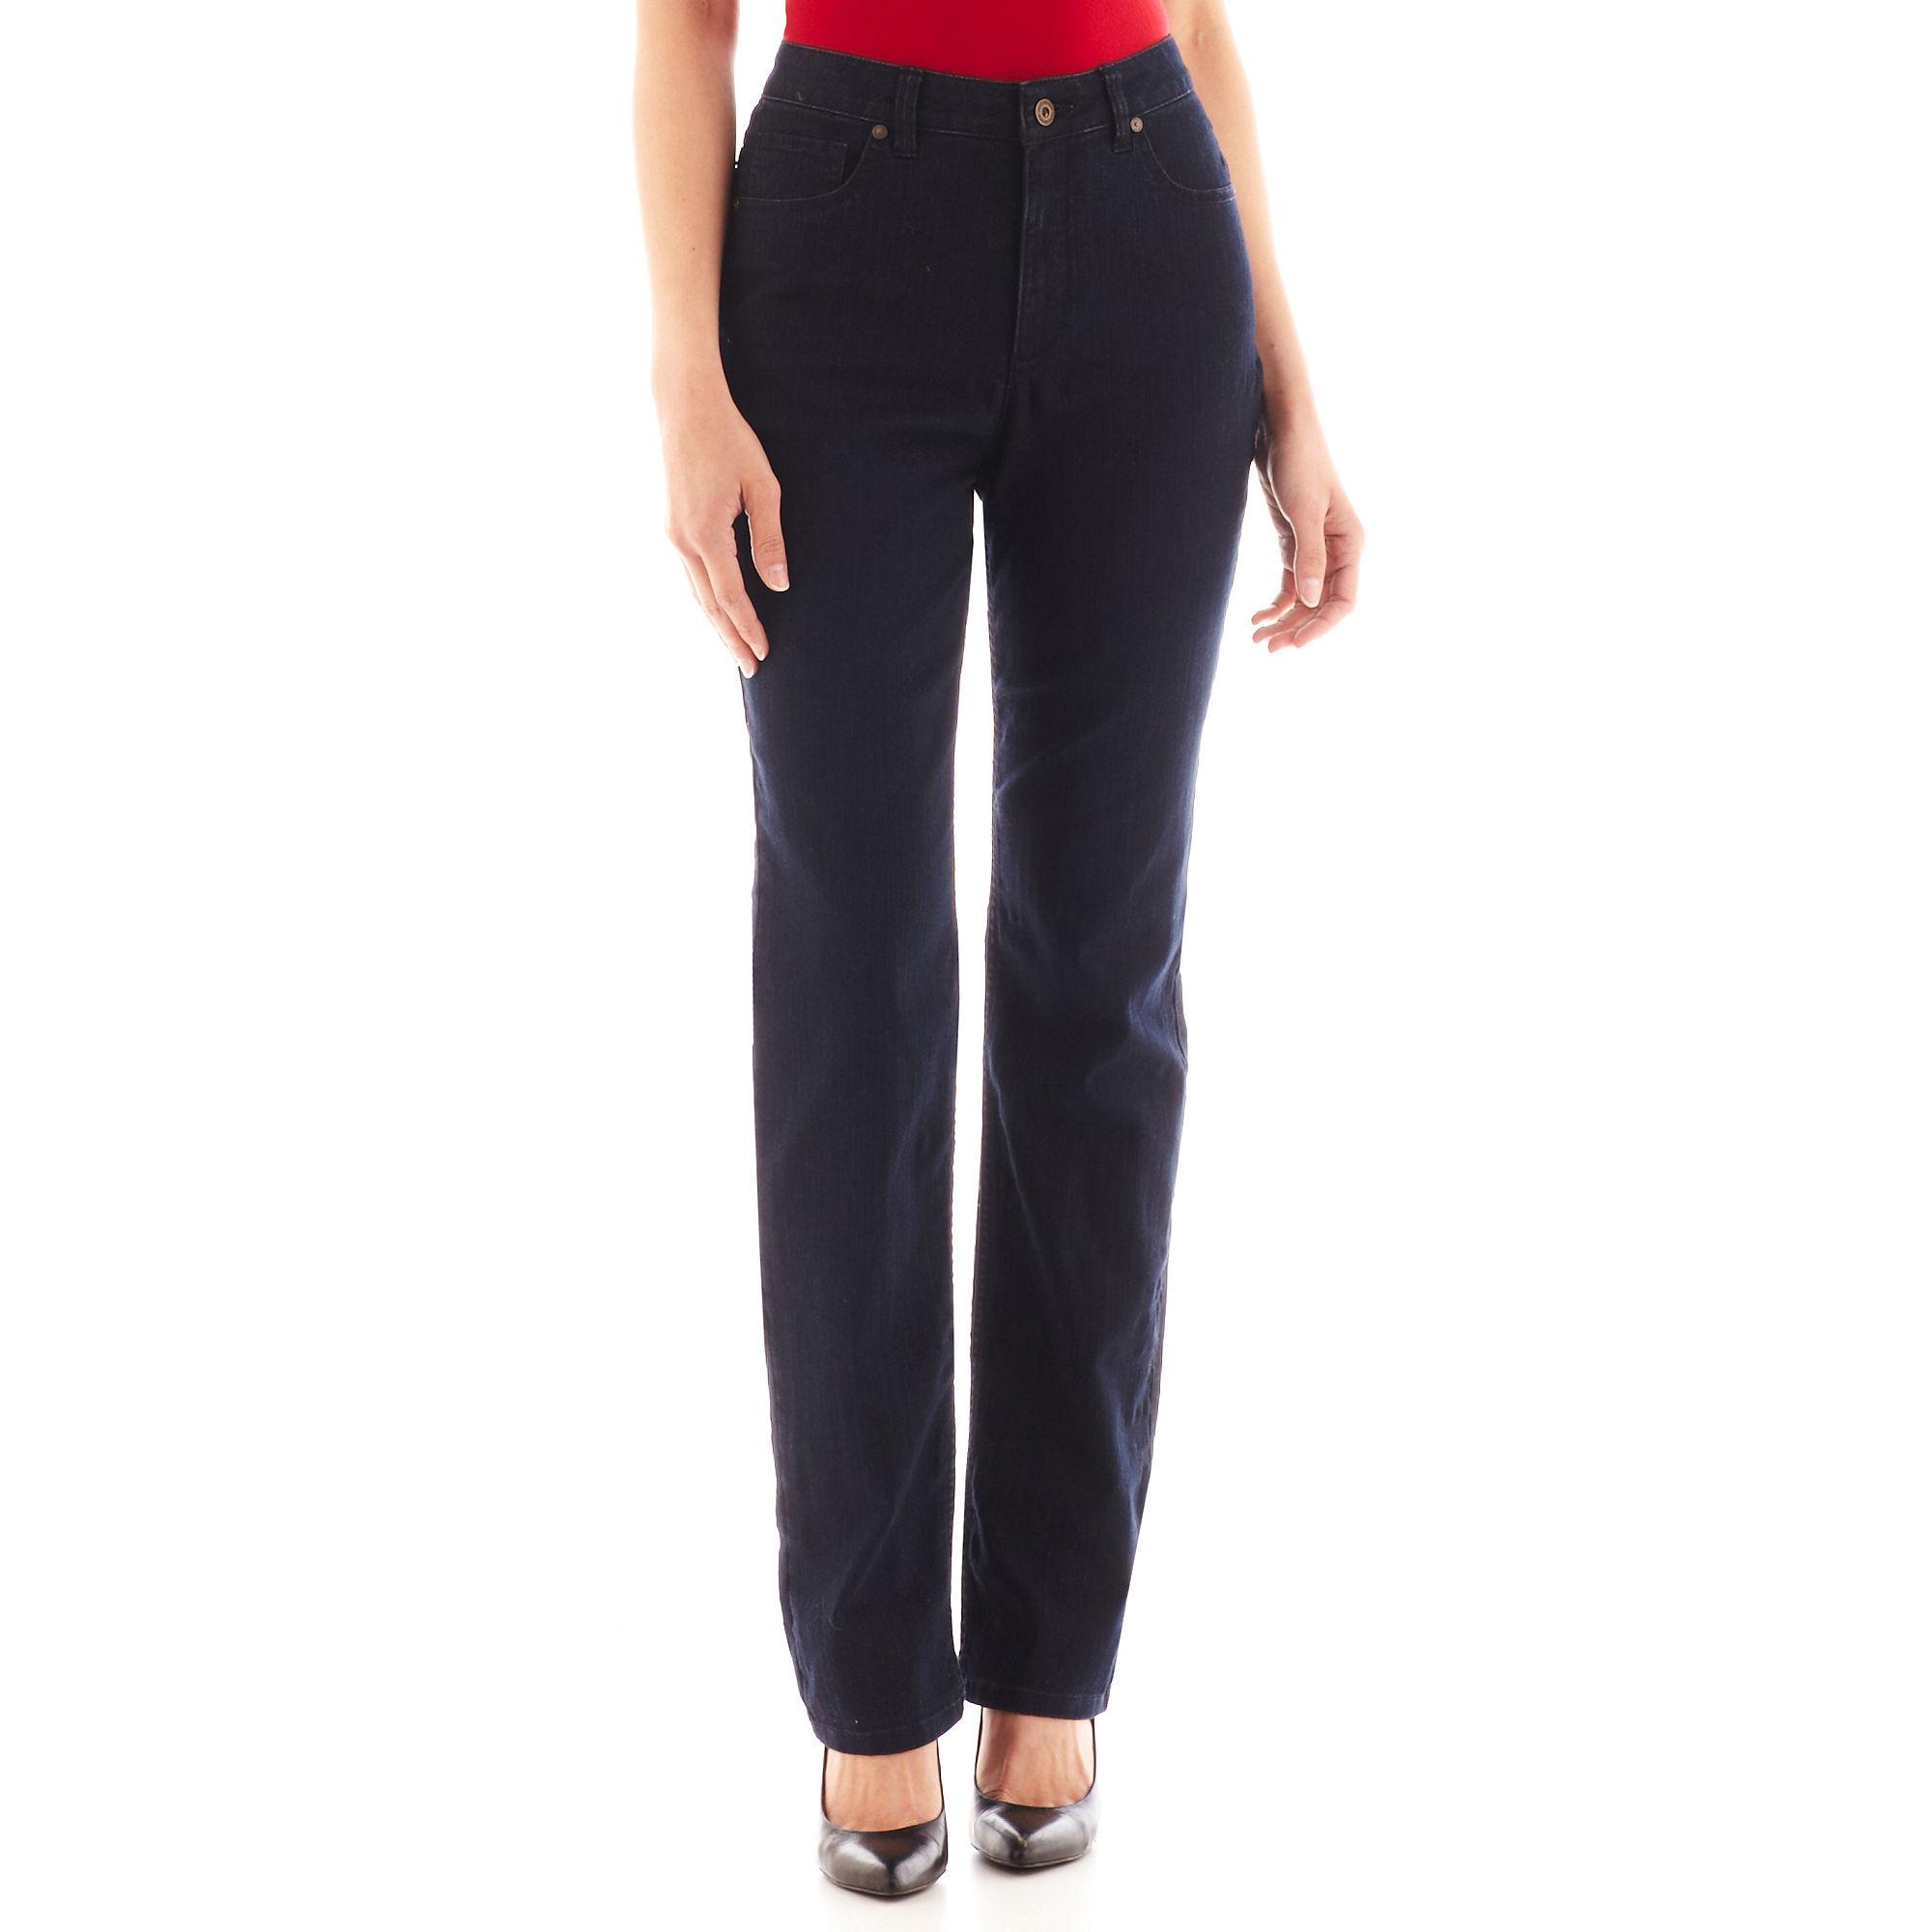 Liz Claiborne Essential Original-Fit Straight-Leg Jeans